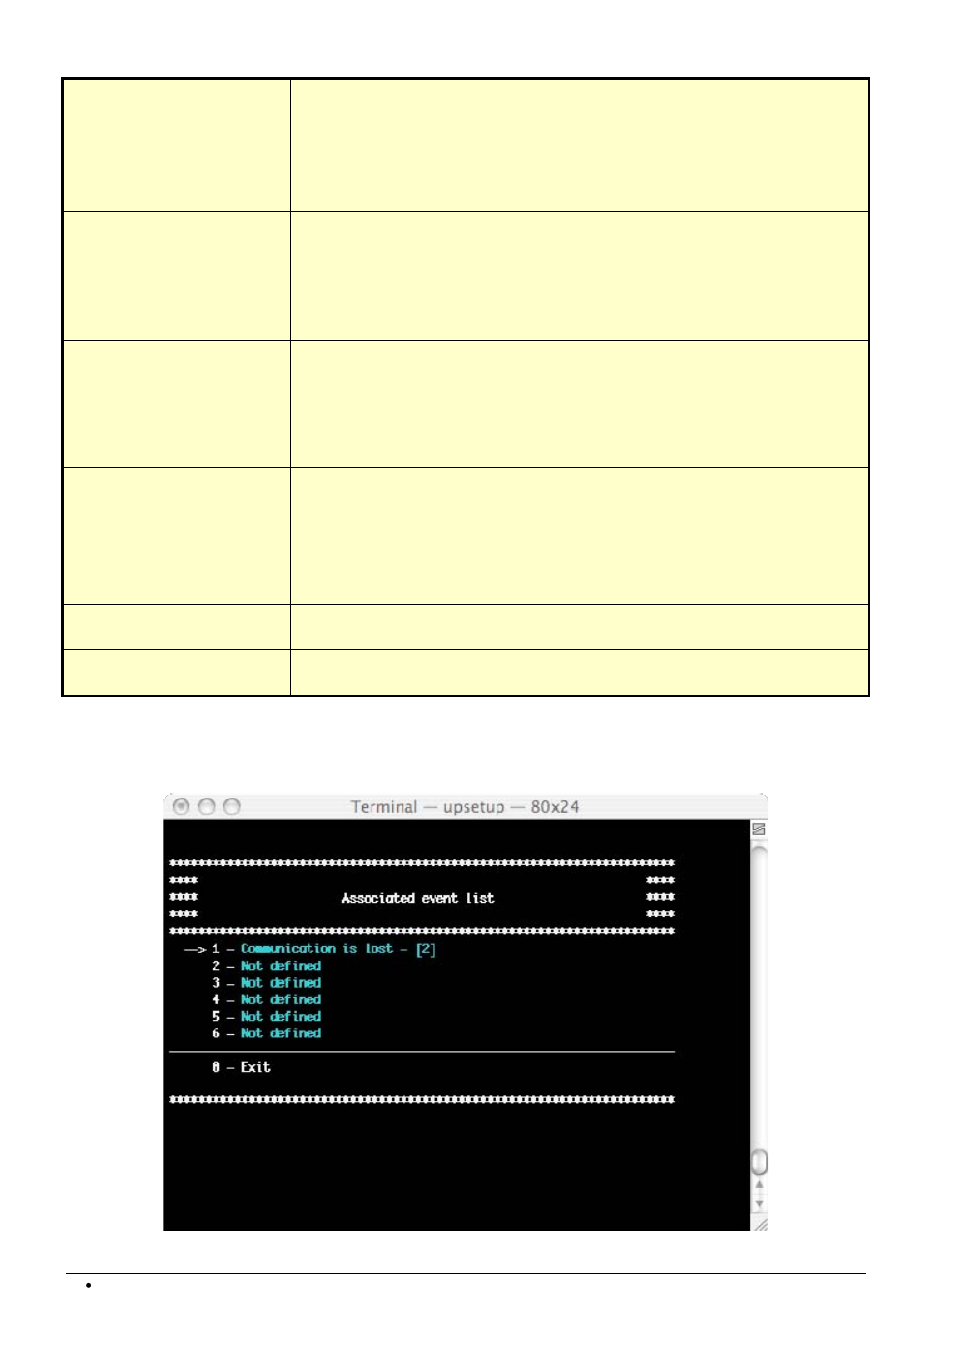 Riello UPS PowerShield³ User Manual | Page 46 / 83